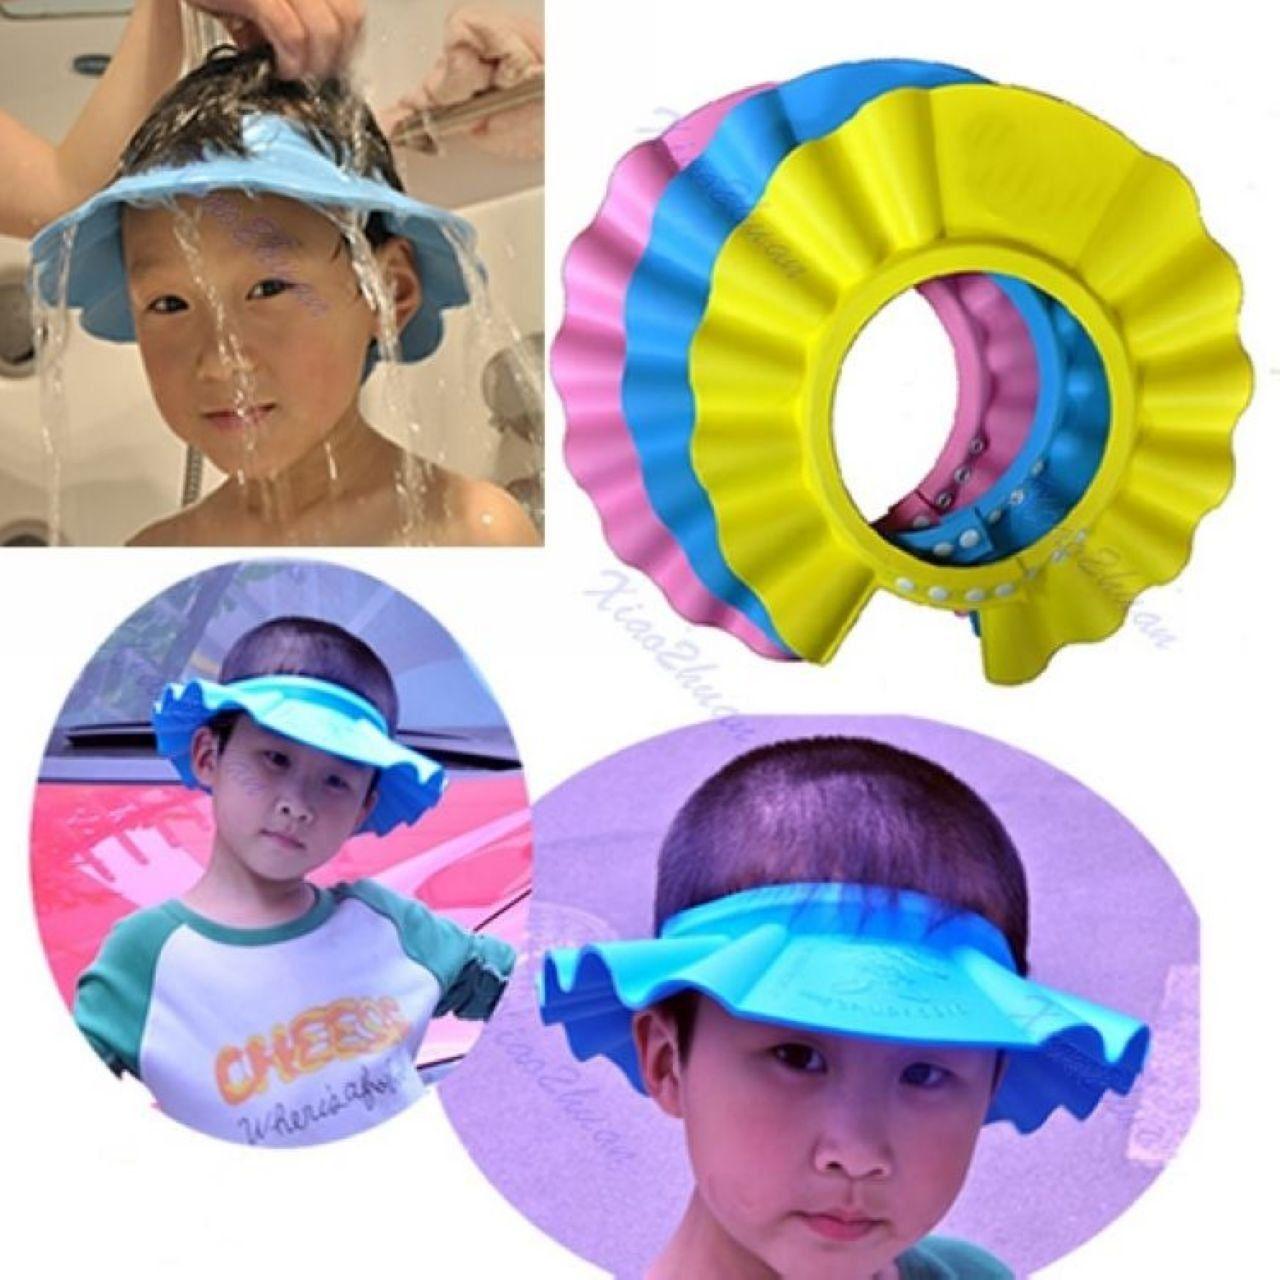 c406e5d40eb Amazon.com   EWIN(R) 4pcs Soft Adjustable Baby Kids Children Shampoo Bath  Bathing Shower Cap Hat Wash Hair Shield Hat   Baby